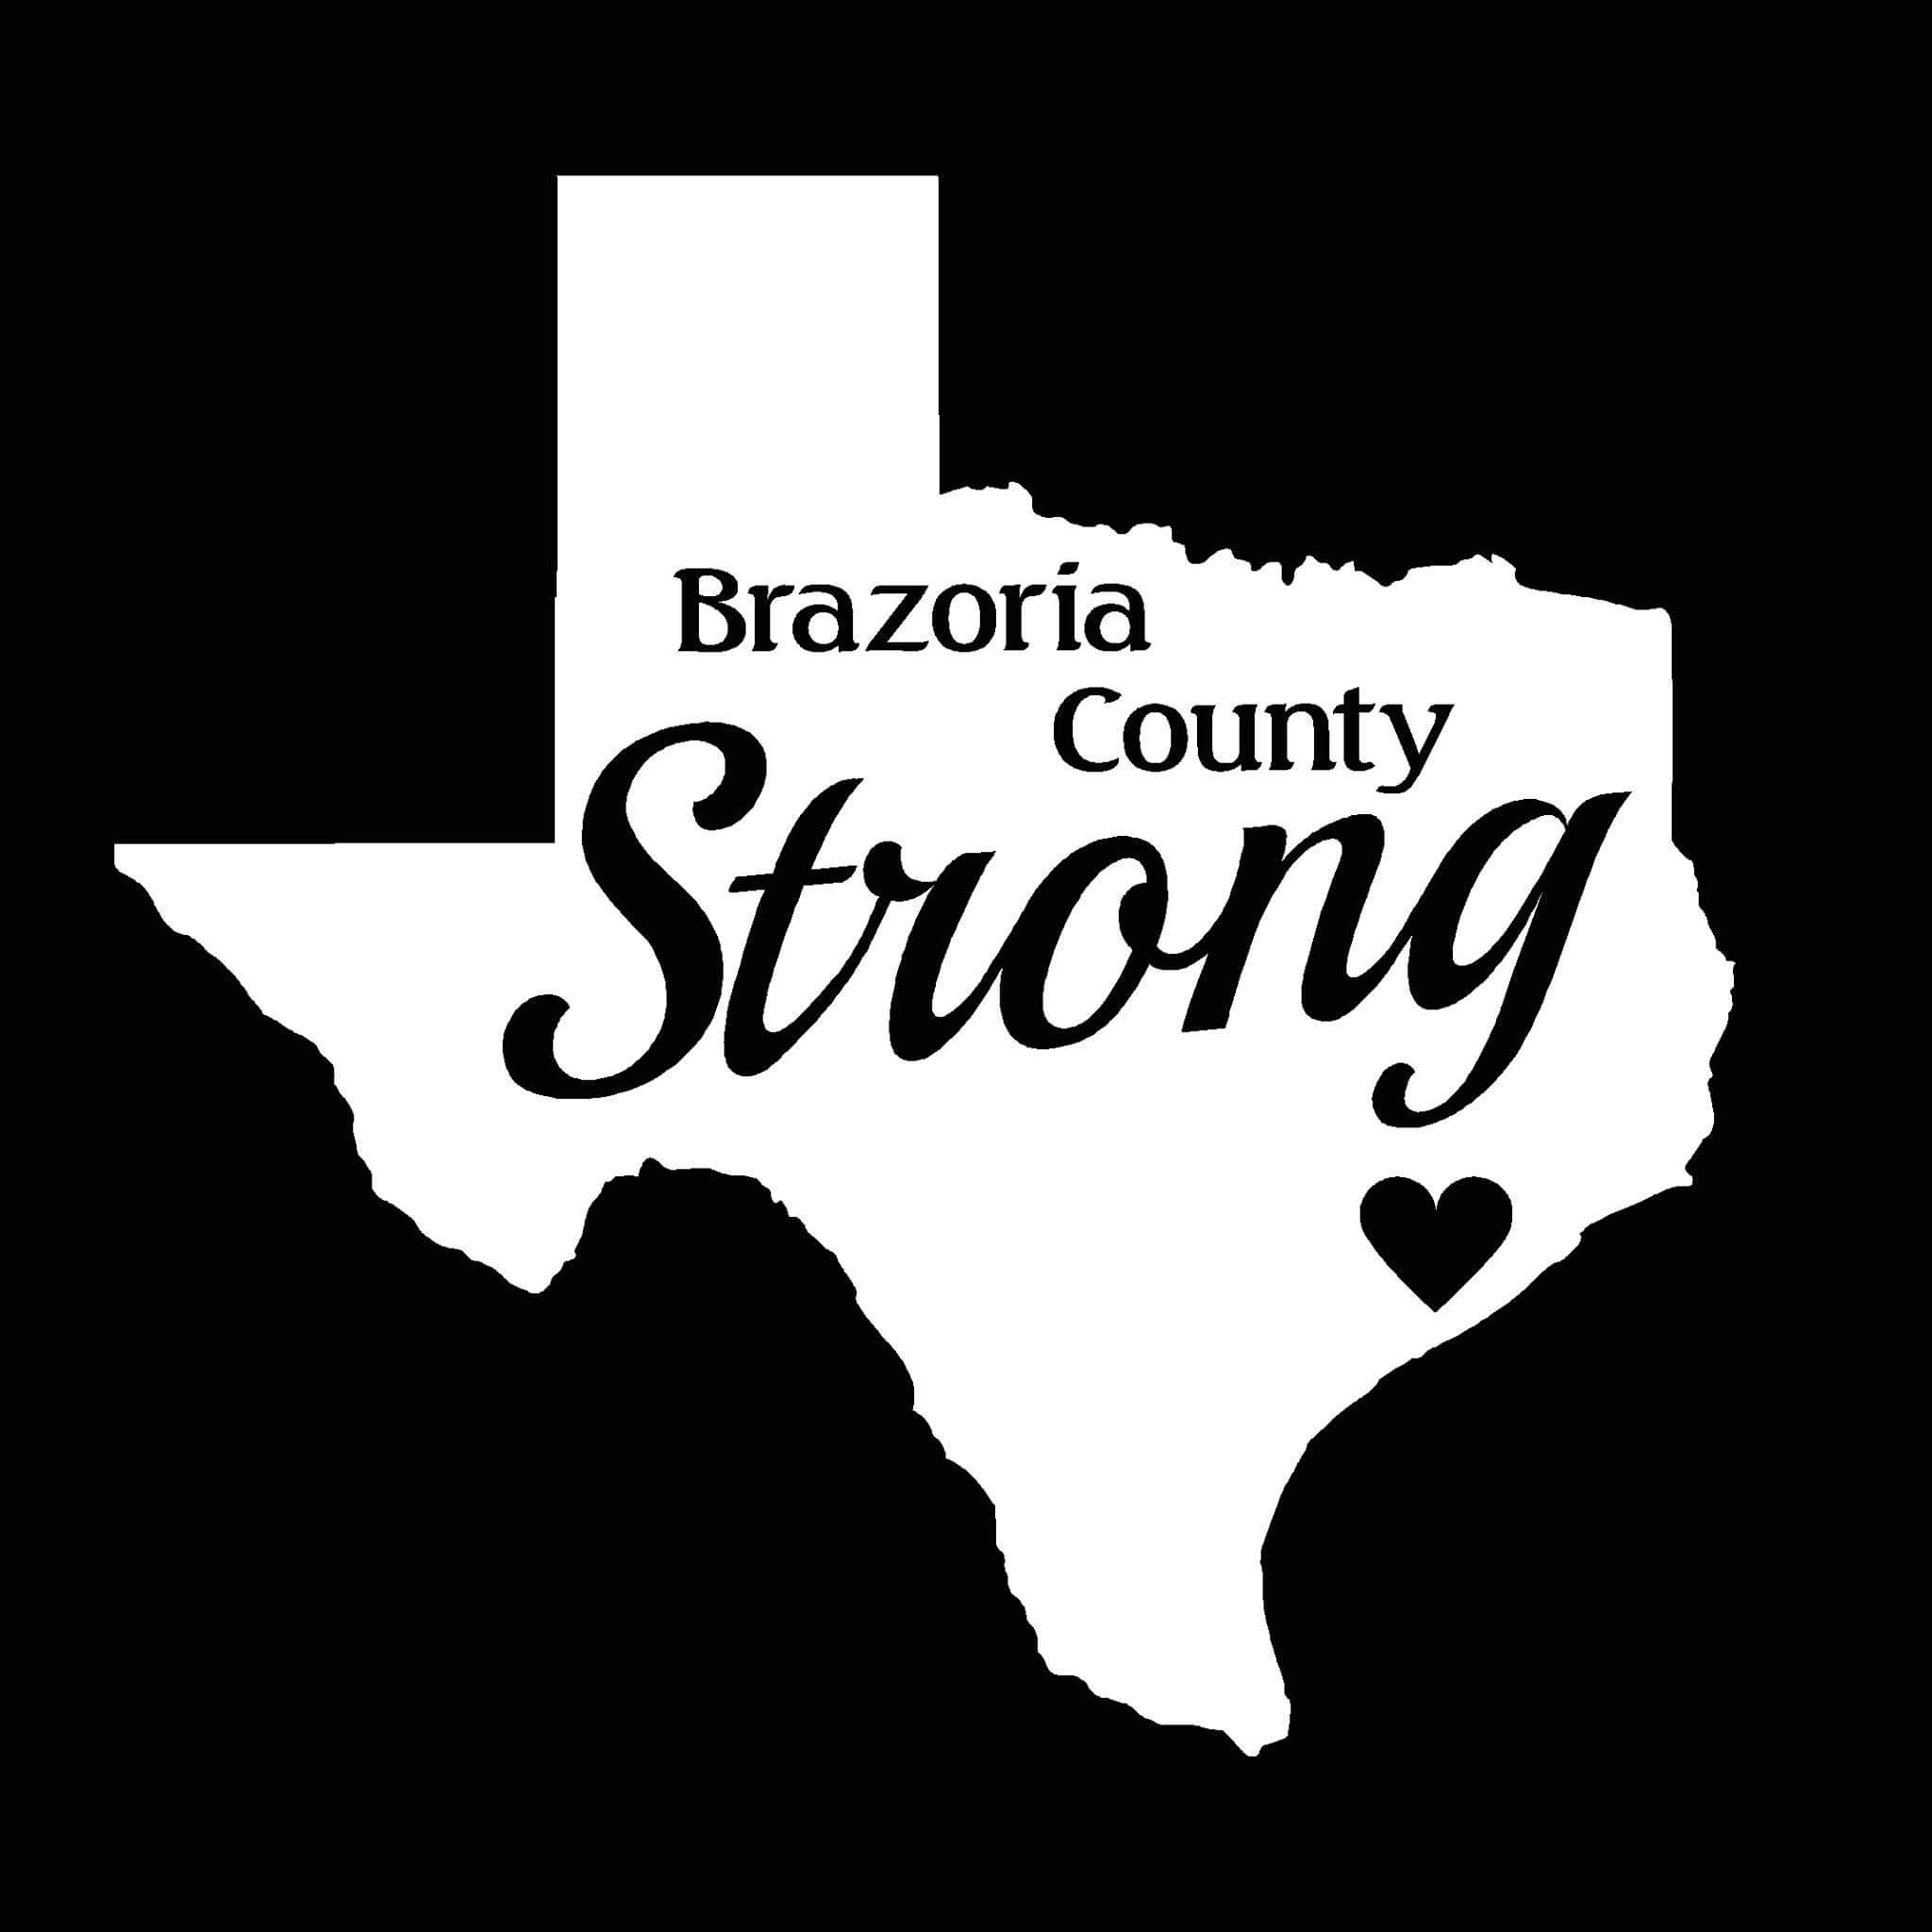 Brazoria County Strong